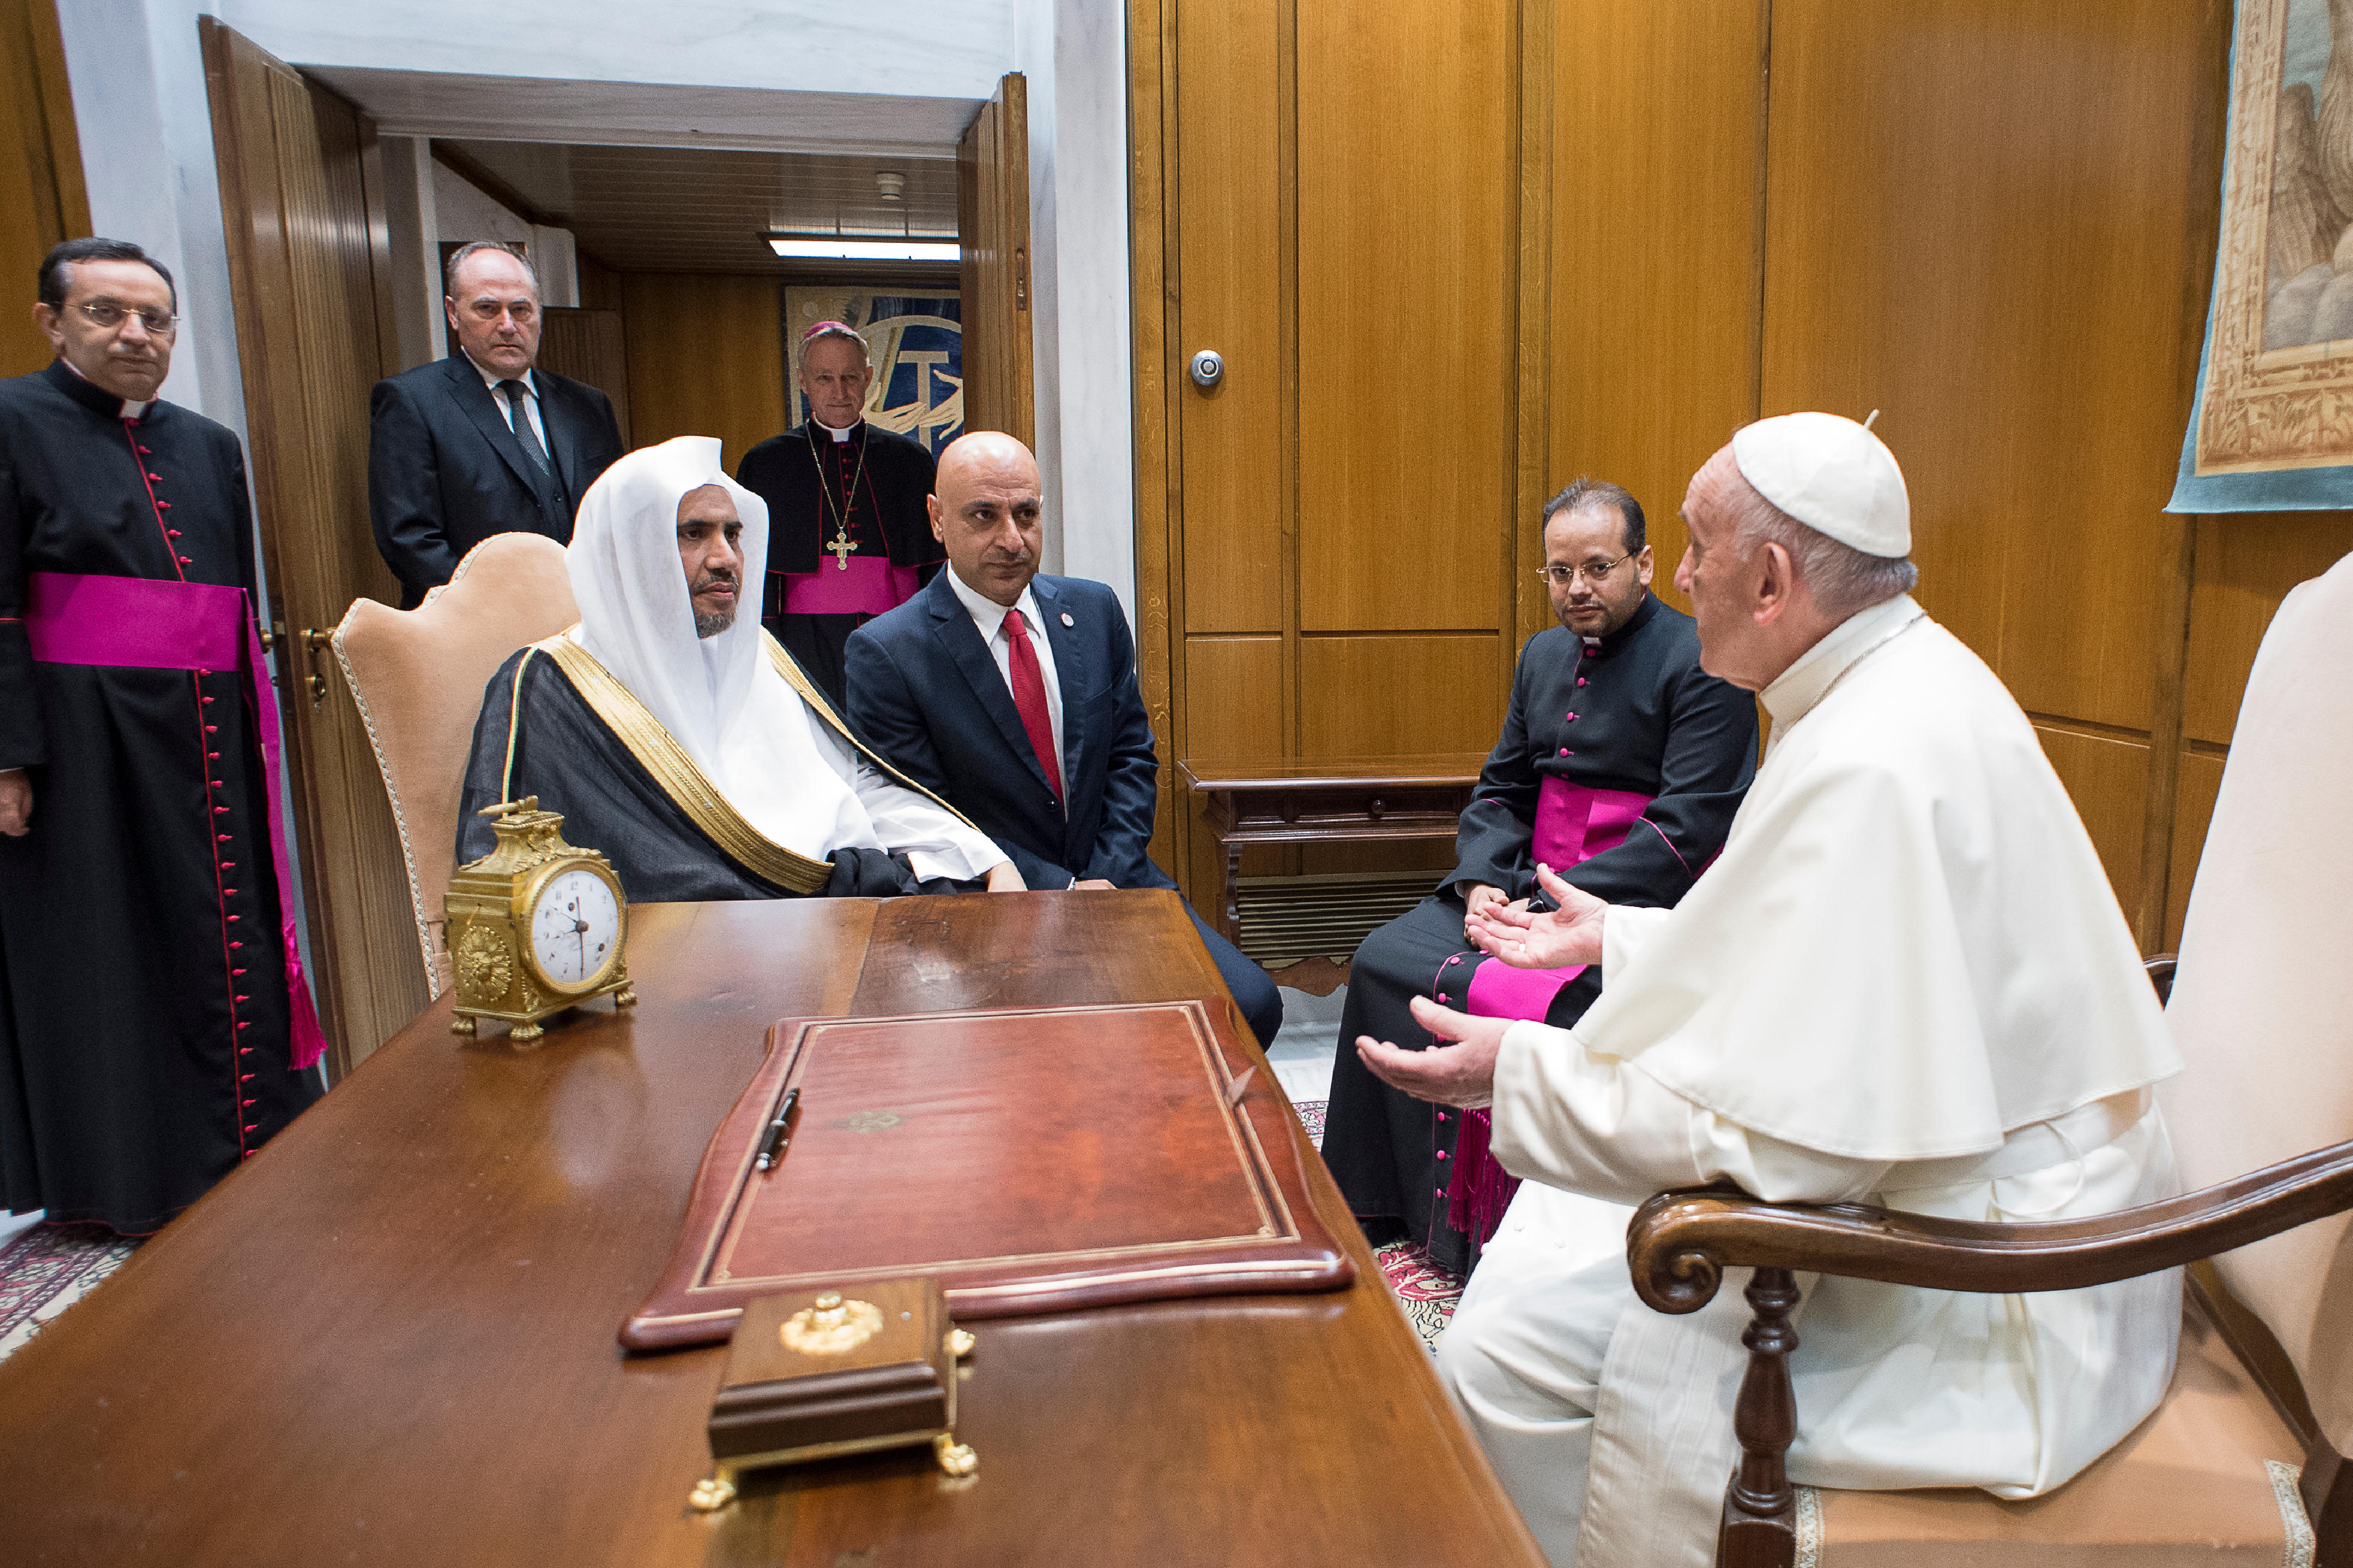 Muhammad al-Issa, Ligue islamique mondiale, 20/09/2017 © L'Osservatore Romano